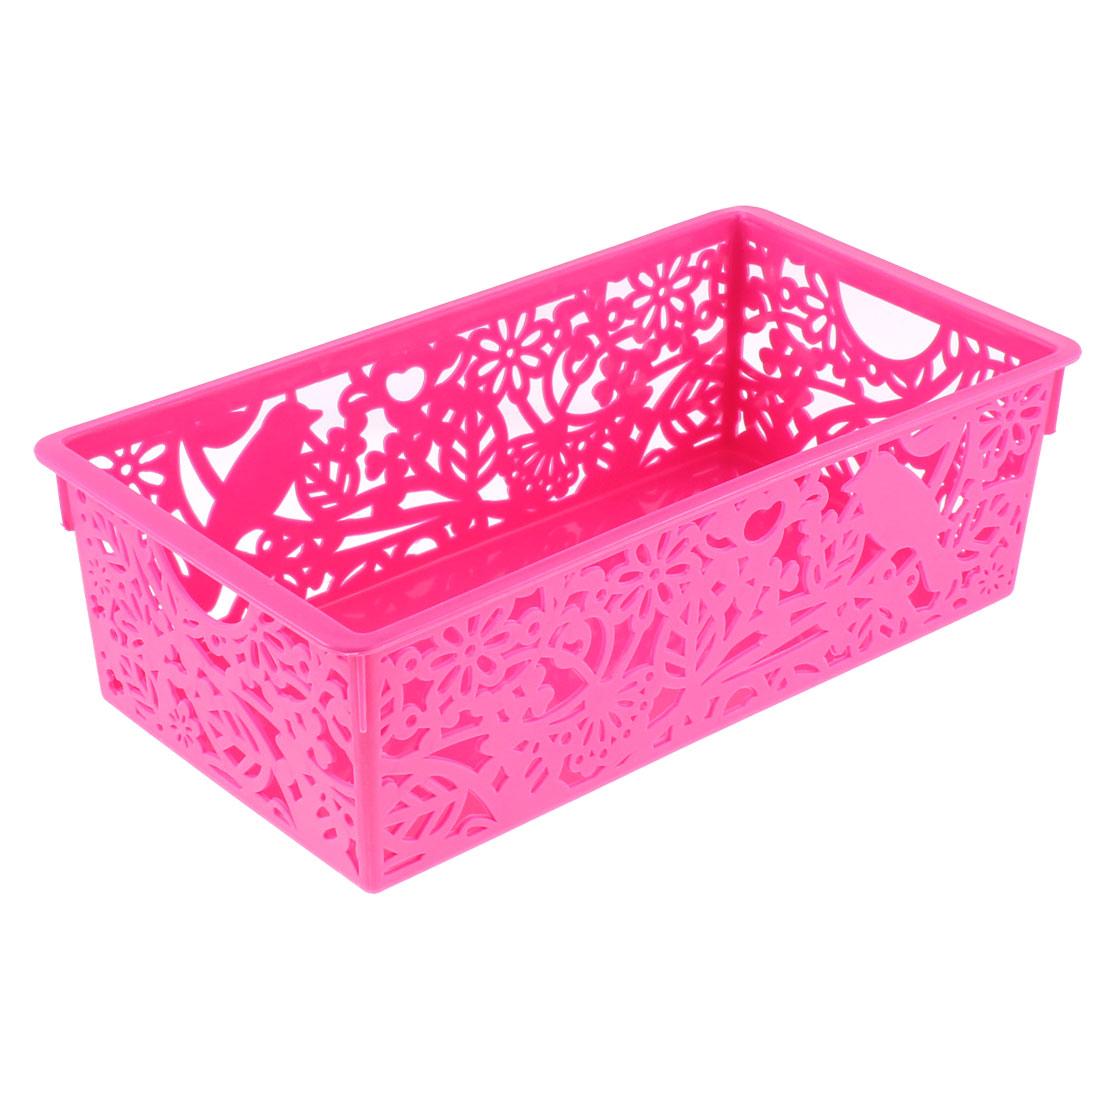 Household Plastic Hollow Out Floral Design Storage Basket 28cmx15cm Fuchsia